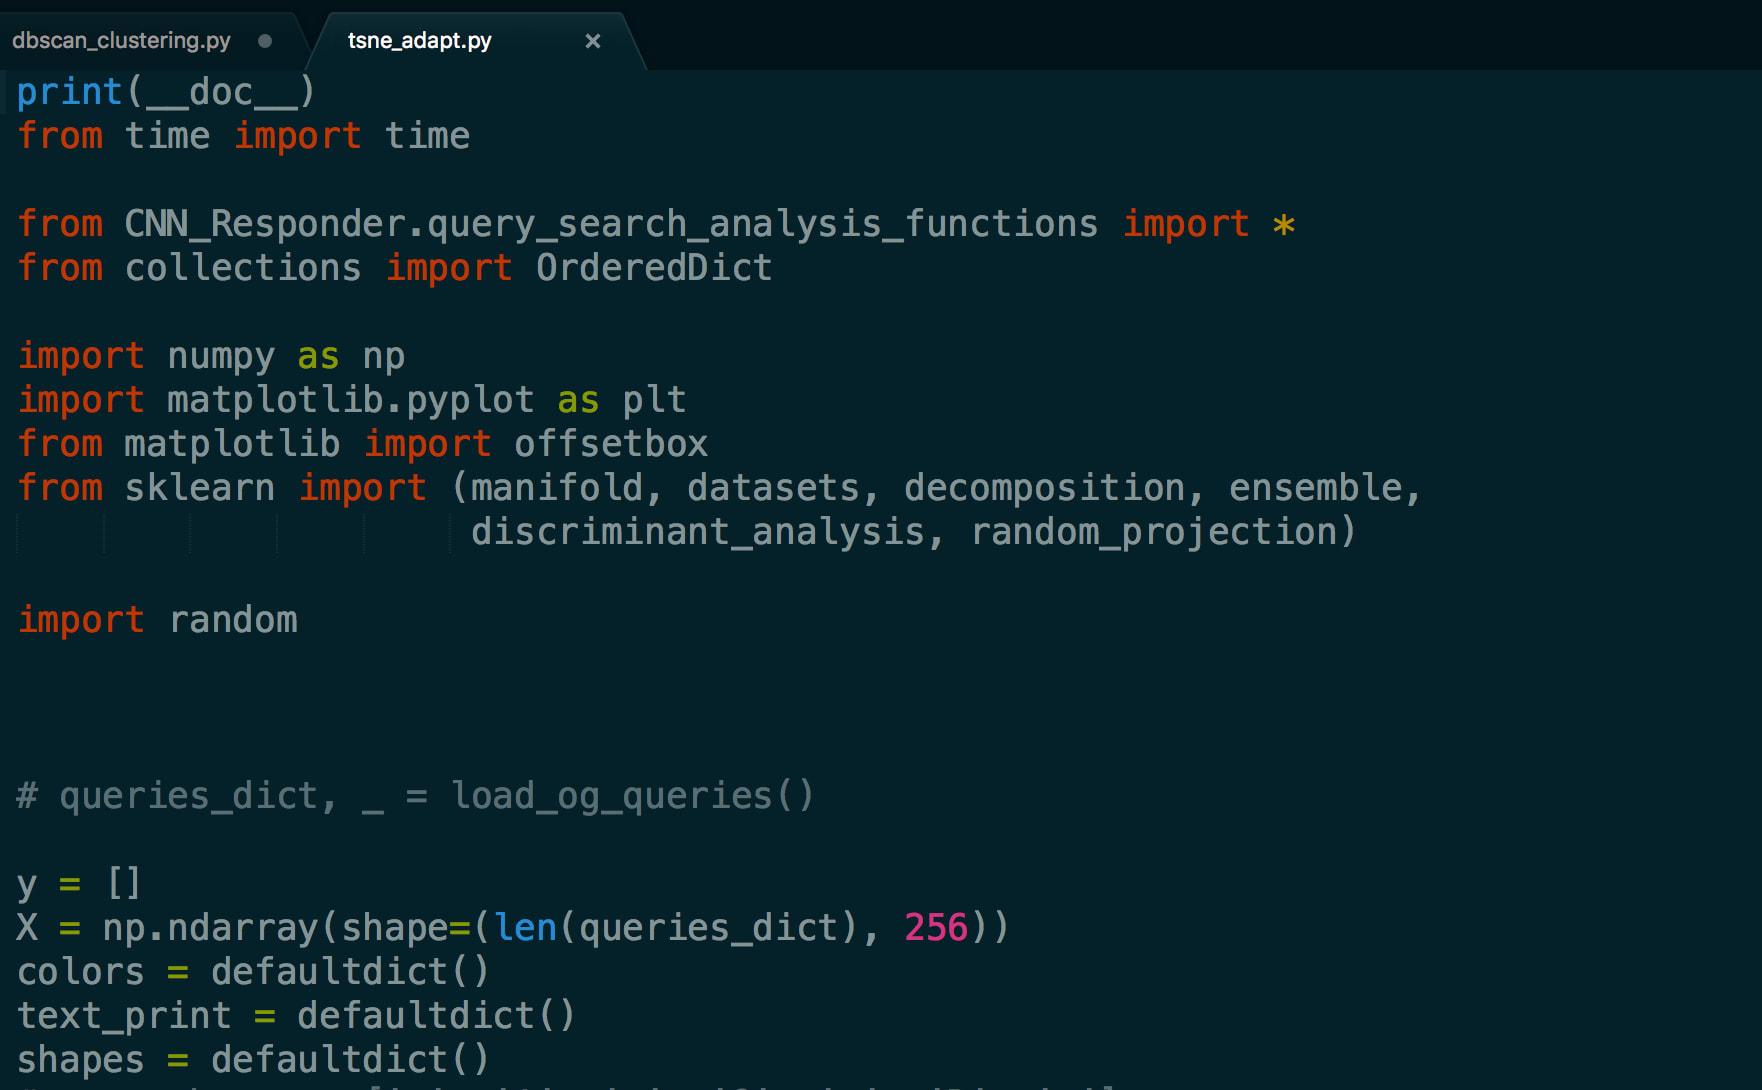 Dbscan code in matlab